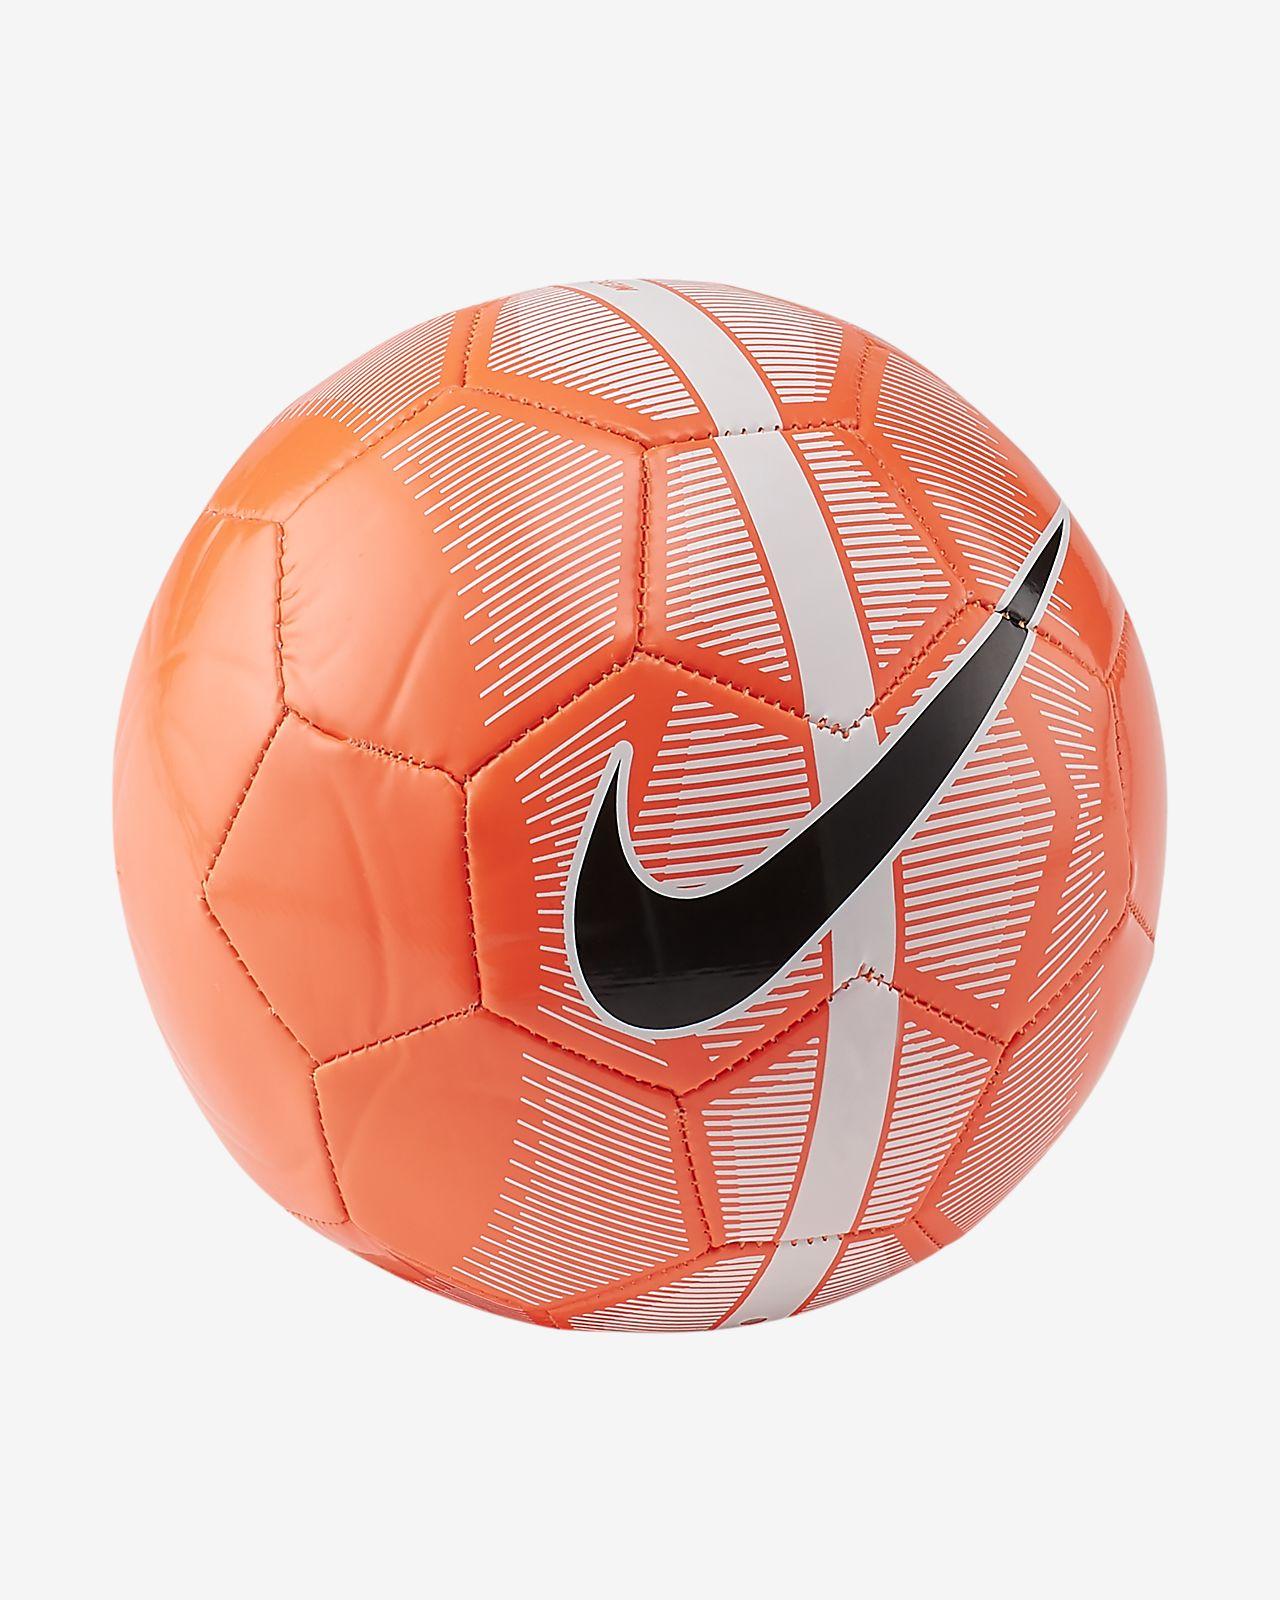 buy online ae975 097e7 ... Ballon de football Nike Mercurial Skills